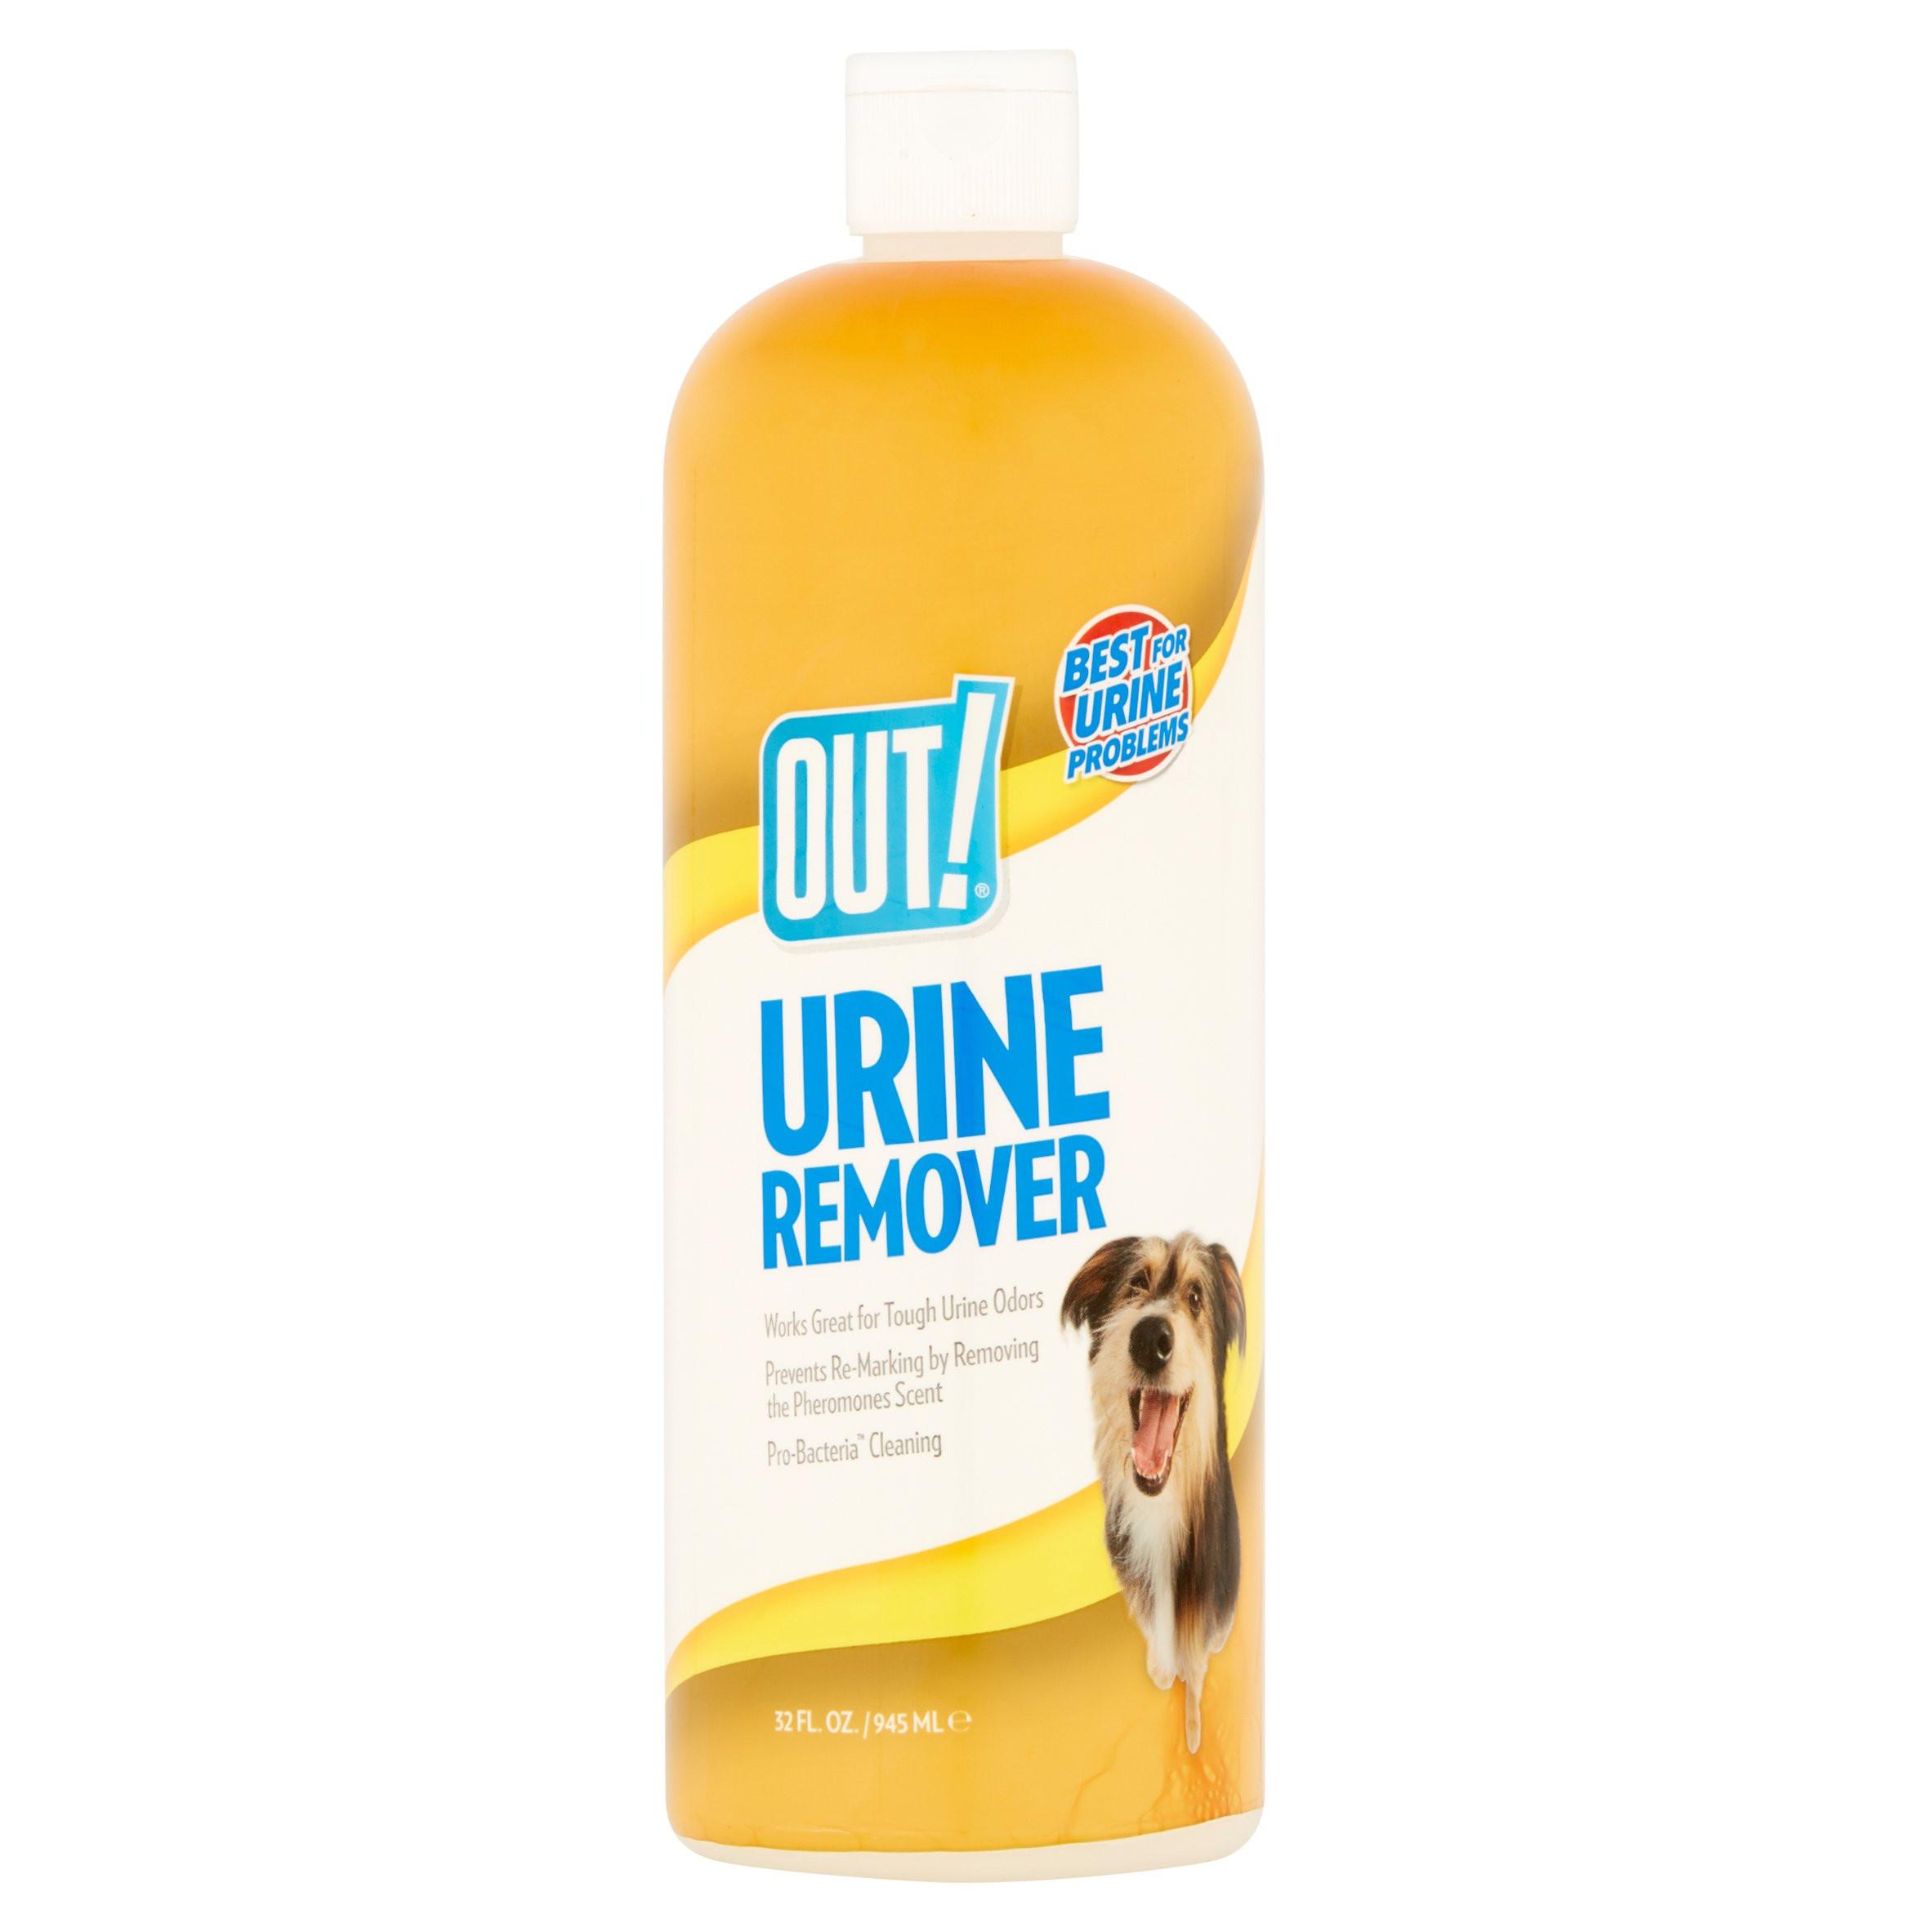 hardwood floor cleaner for pets of as seen on tv urine gone pet stain odor remover 24 fl oz regarding pet stain odor remover 24 fl oz walmart com